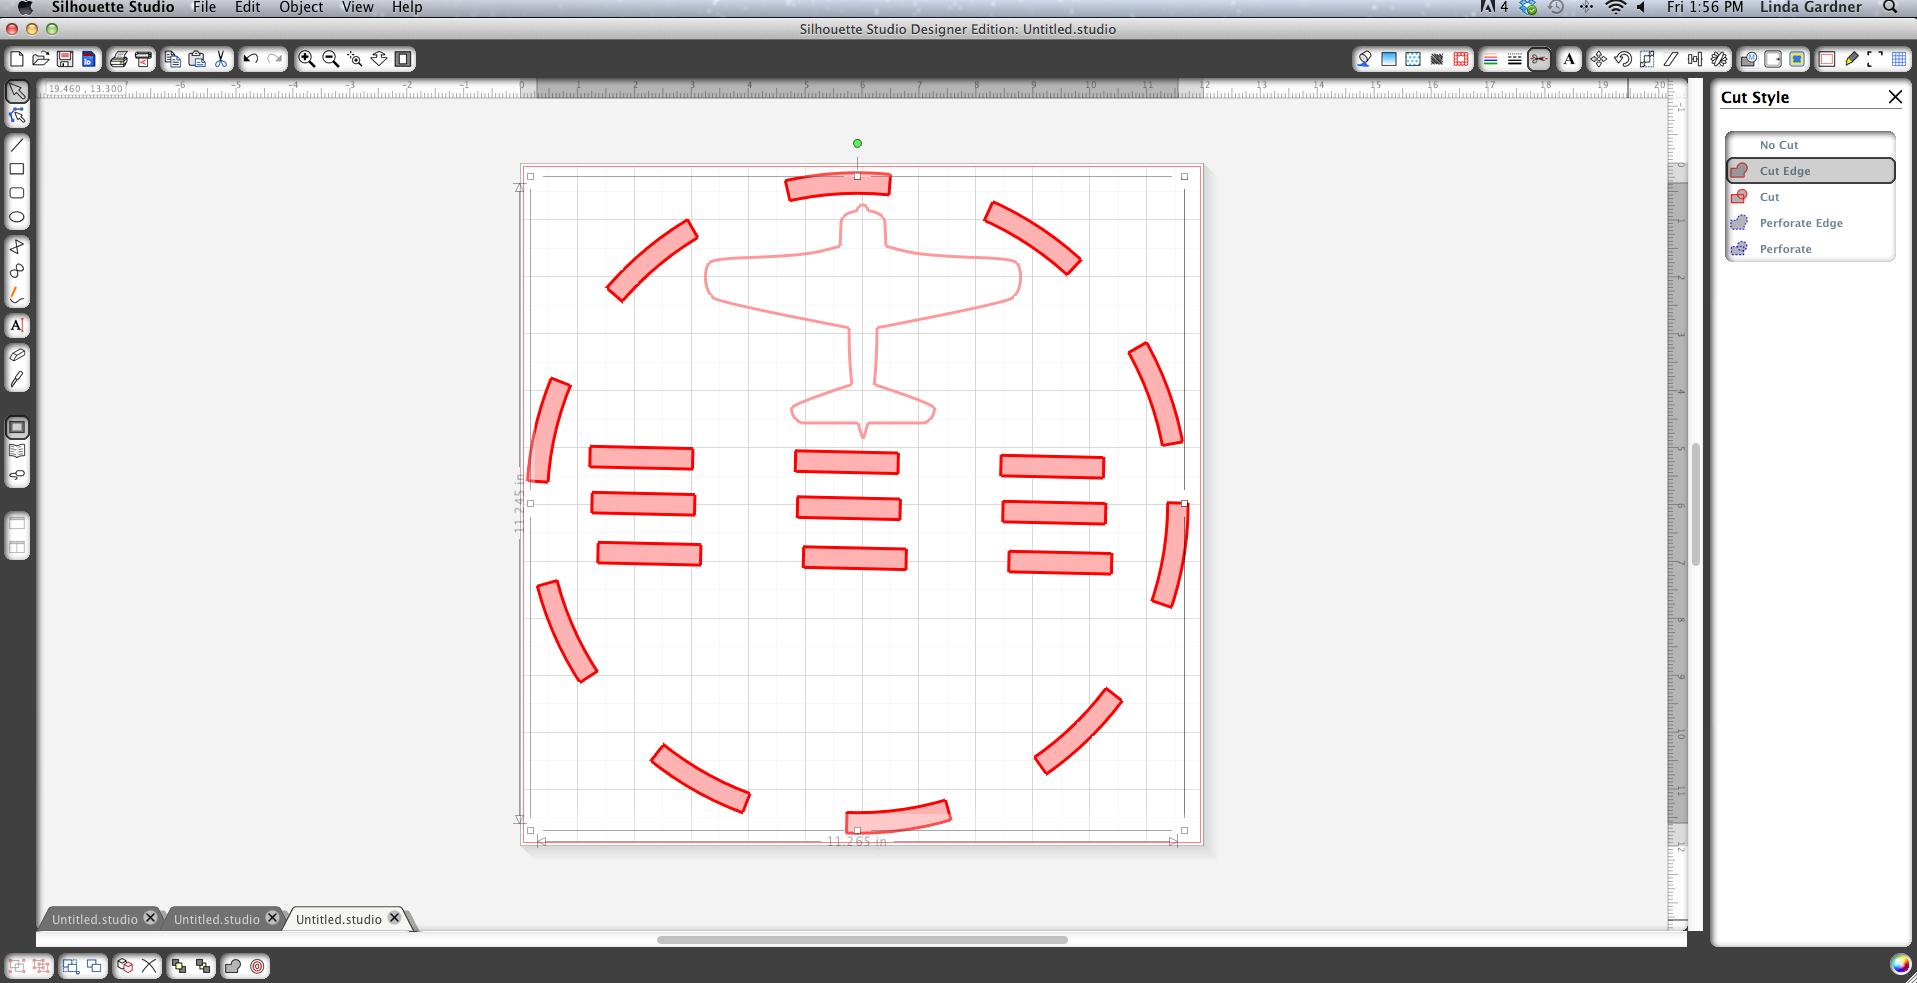 Silhouette designer software